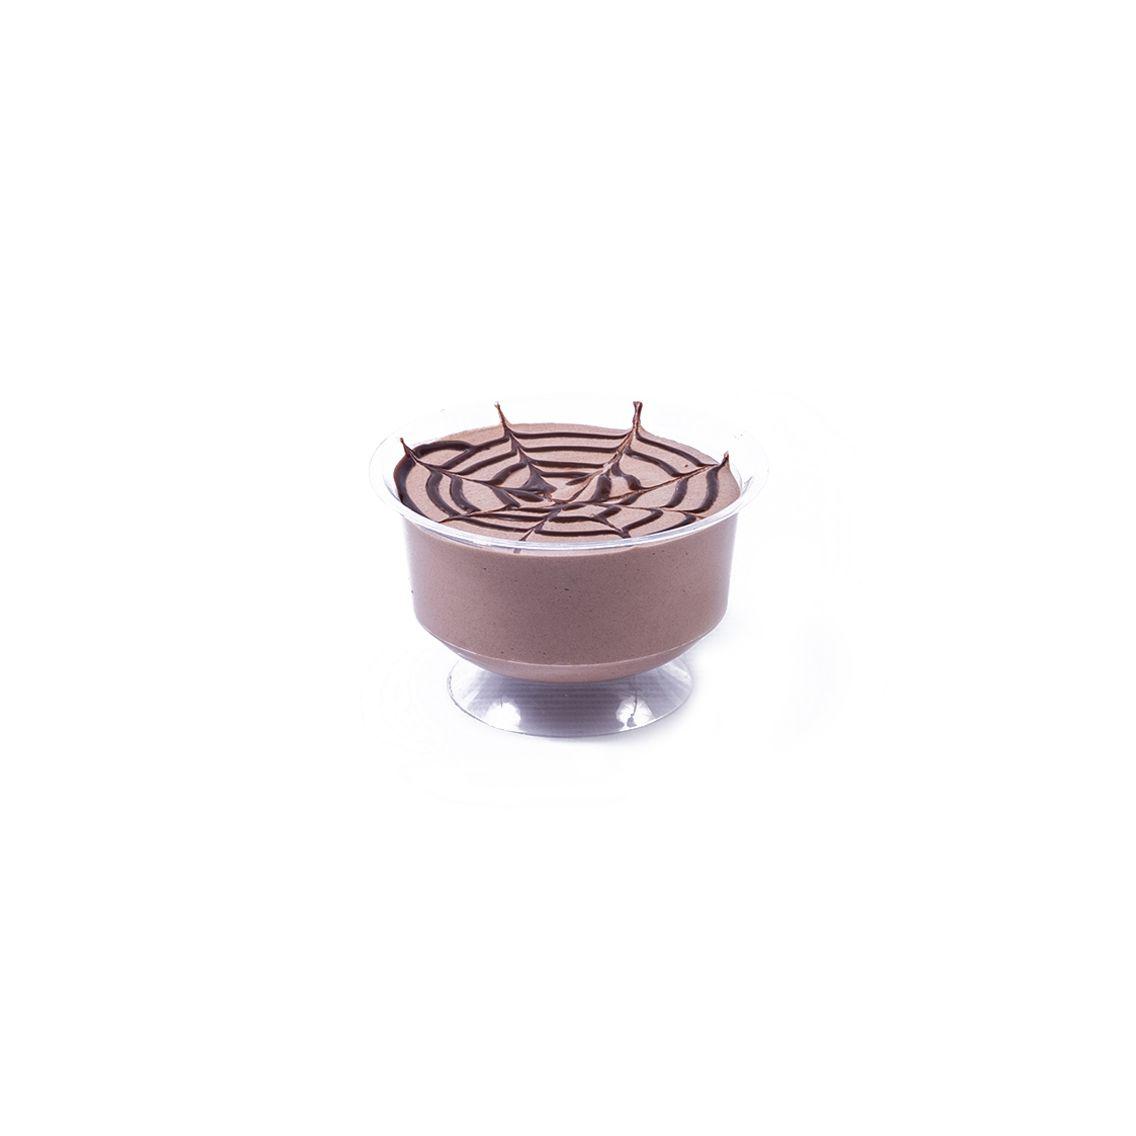 Kitchen Cuisine Default Category Chocolate Mousse Cup